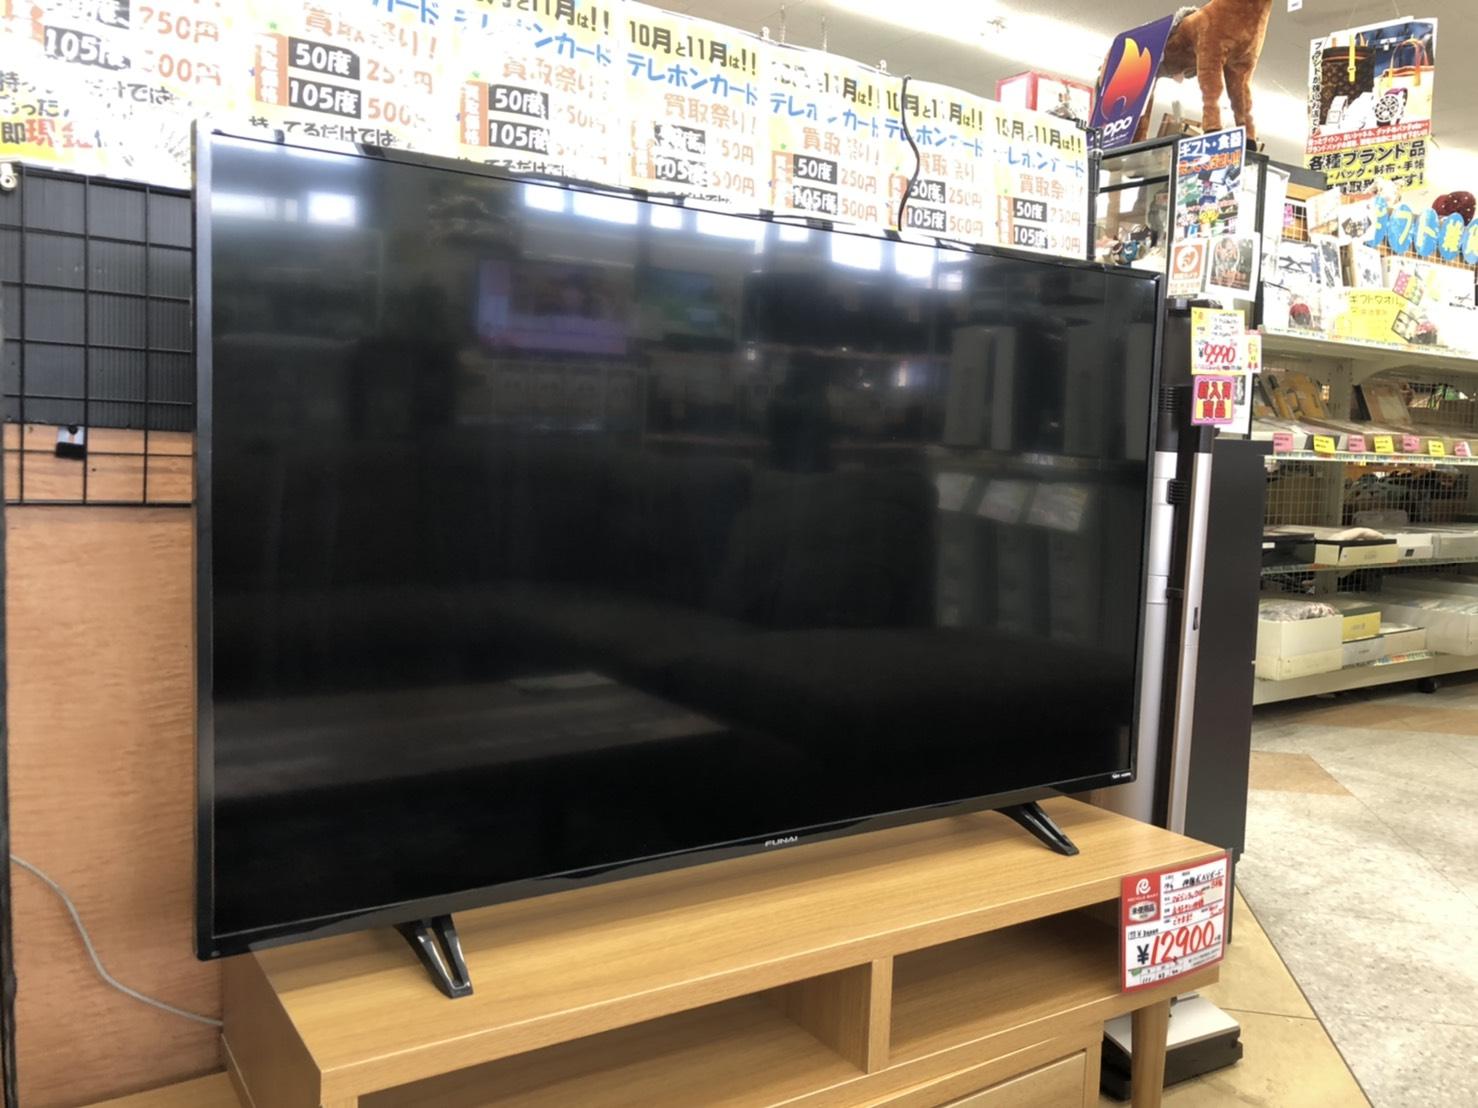 【FUNAI(フナイ) / 4K対応50型液晶テレビ / 2019年 / FL-50U3020】買取させて頂きました! の買取-